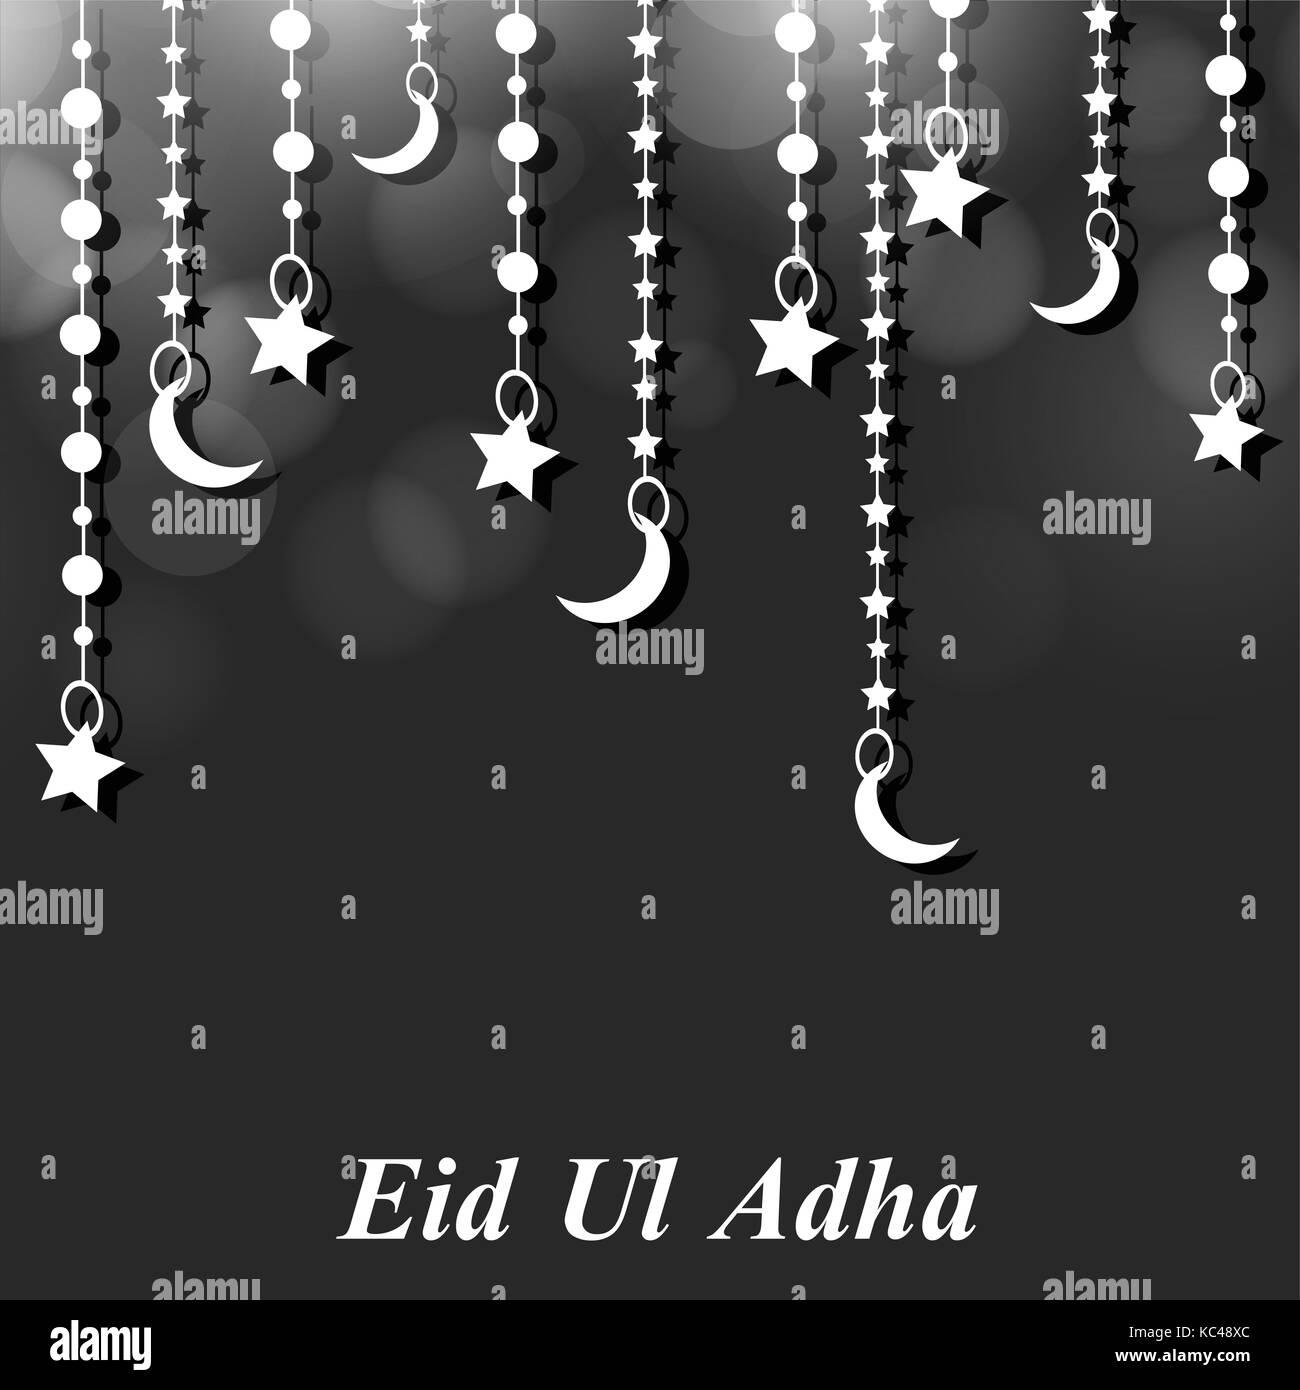 illustration of Muslim Festival Eid Ul Adha Background - Stock Image